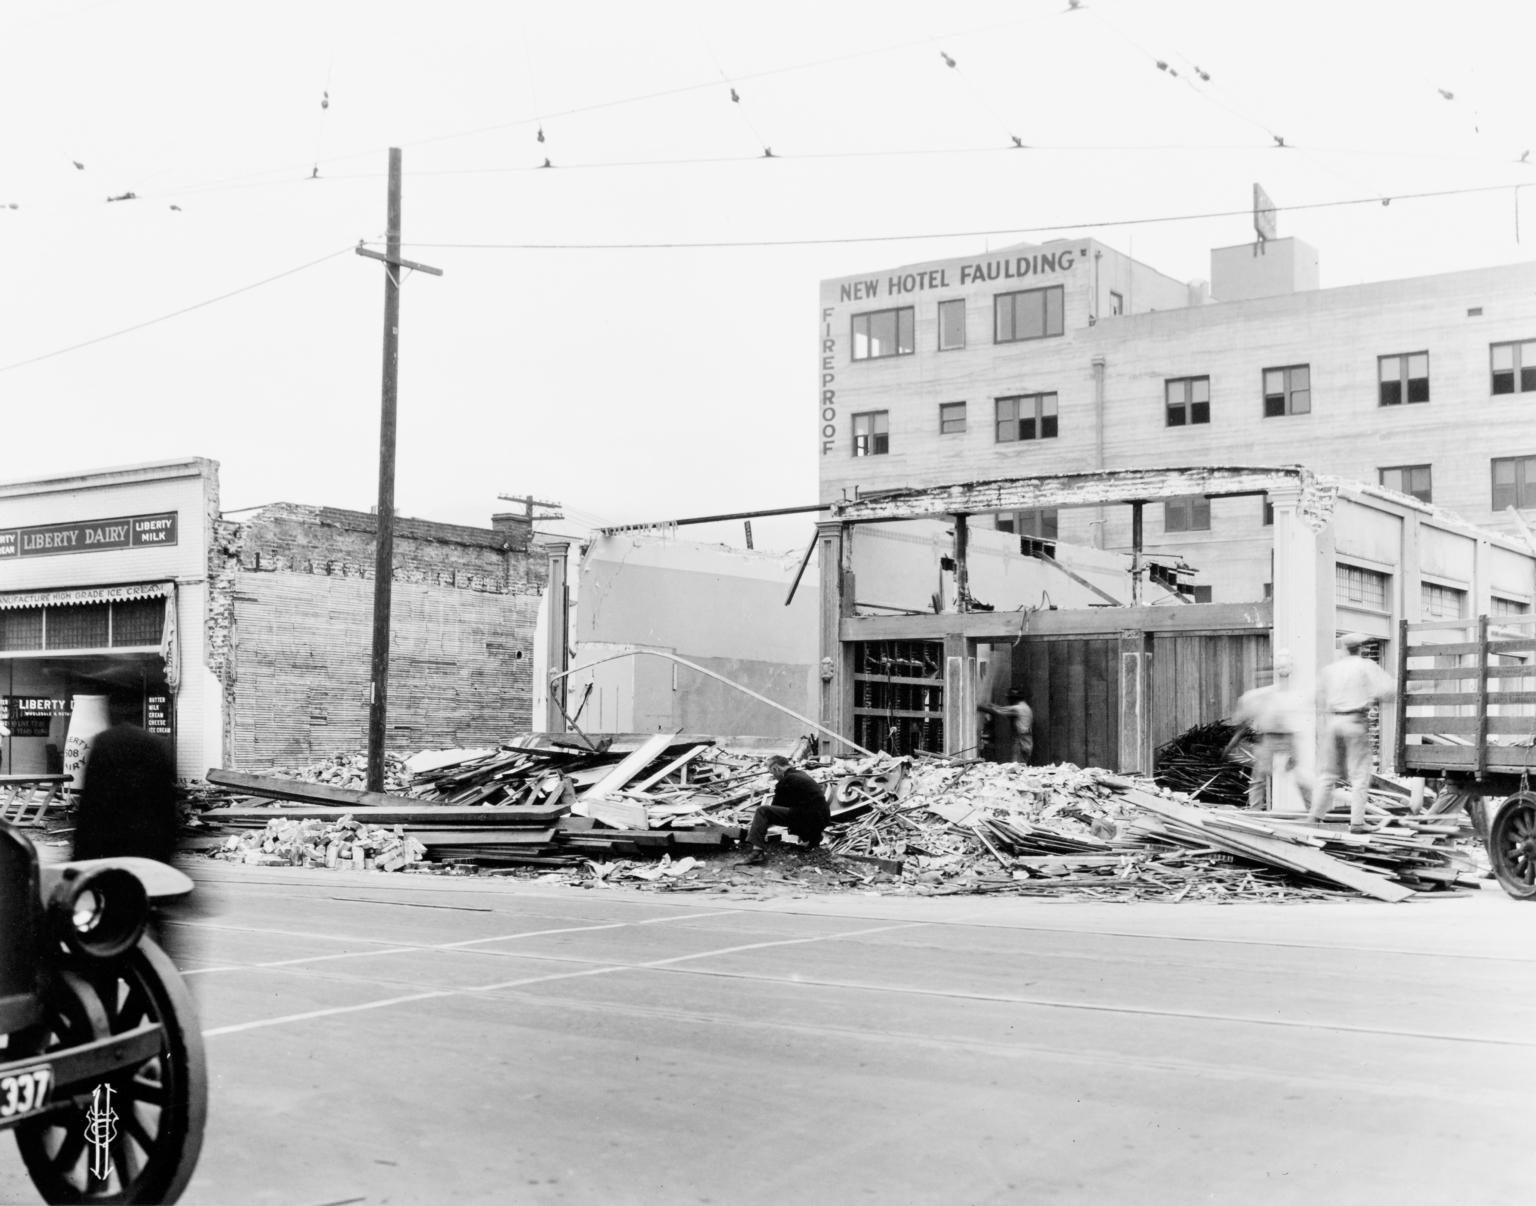 Santa Barbara 1925 Earthquake Damage - 500 Block State Street